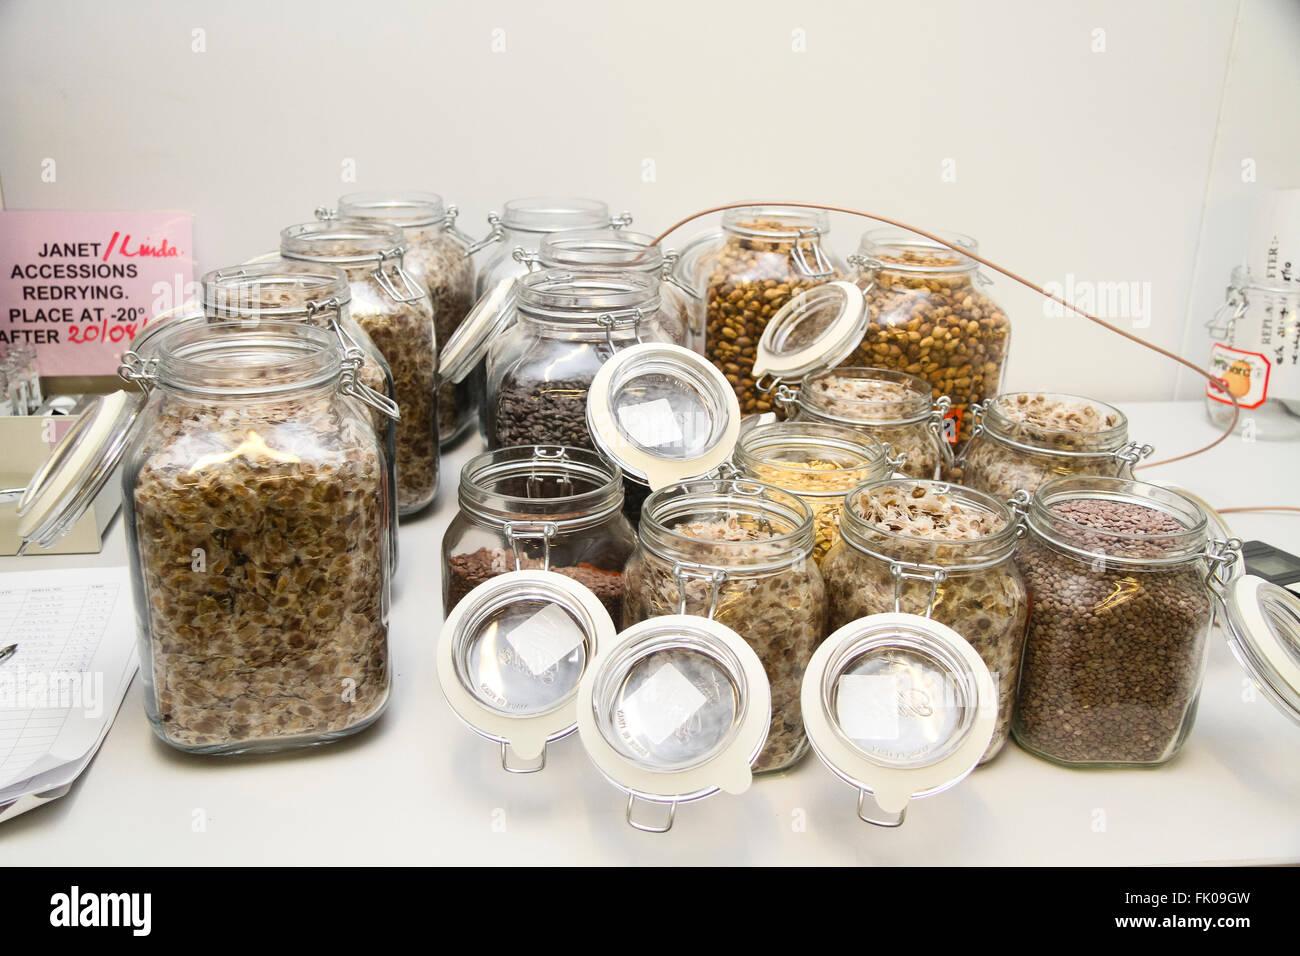 Kew Millennium Seedbank, West Sussex, UK. Kilner jars full of seeds. - Stock Image